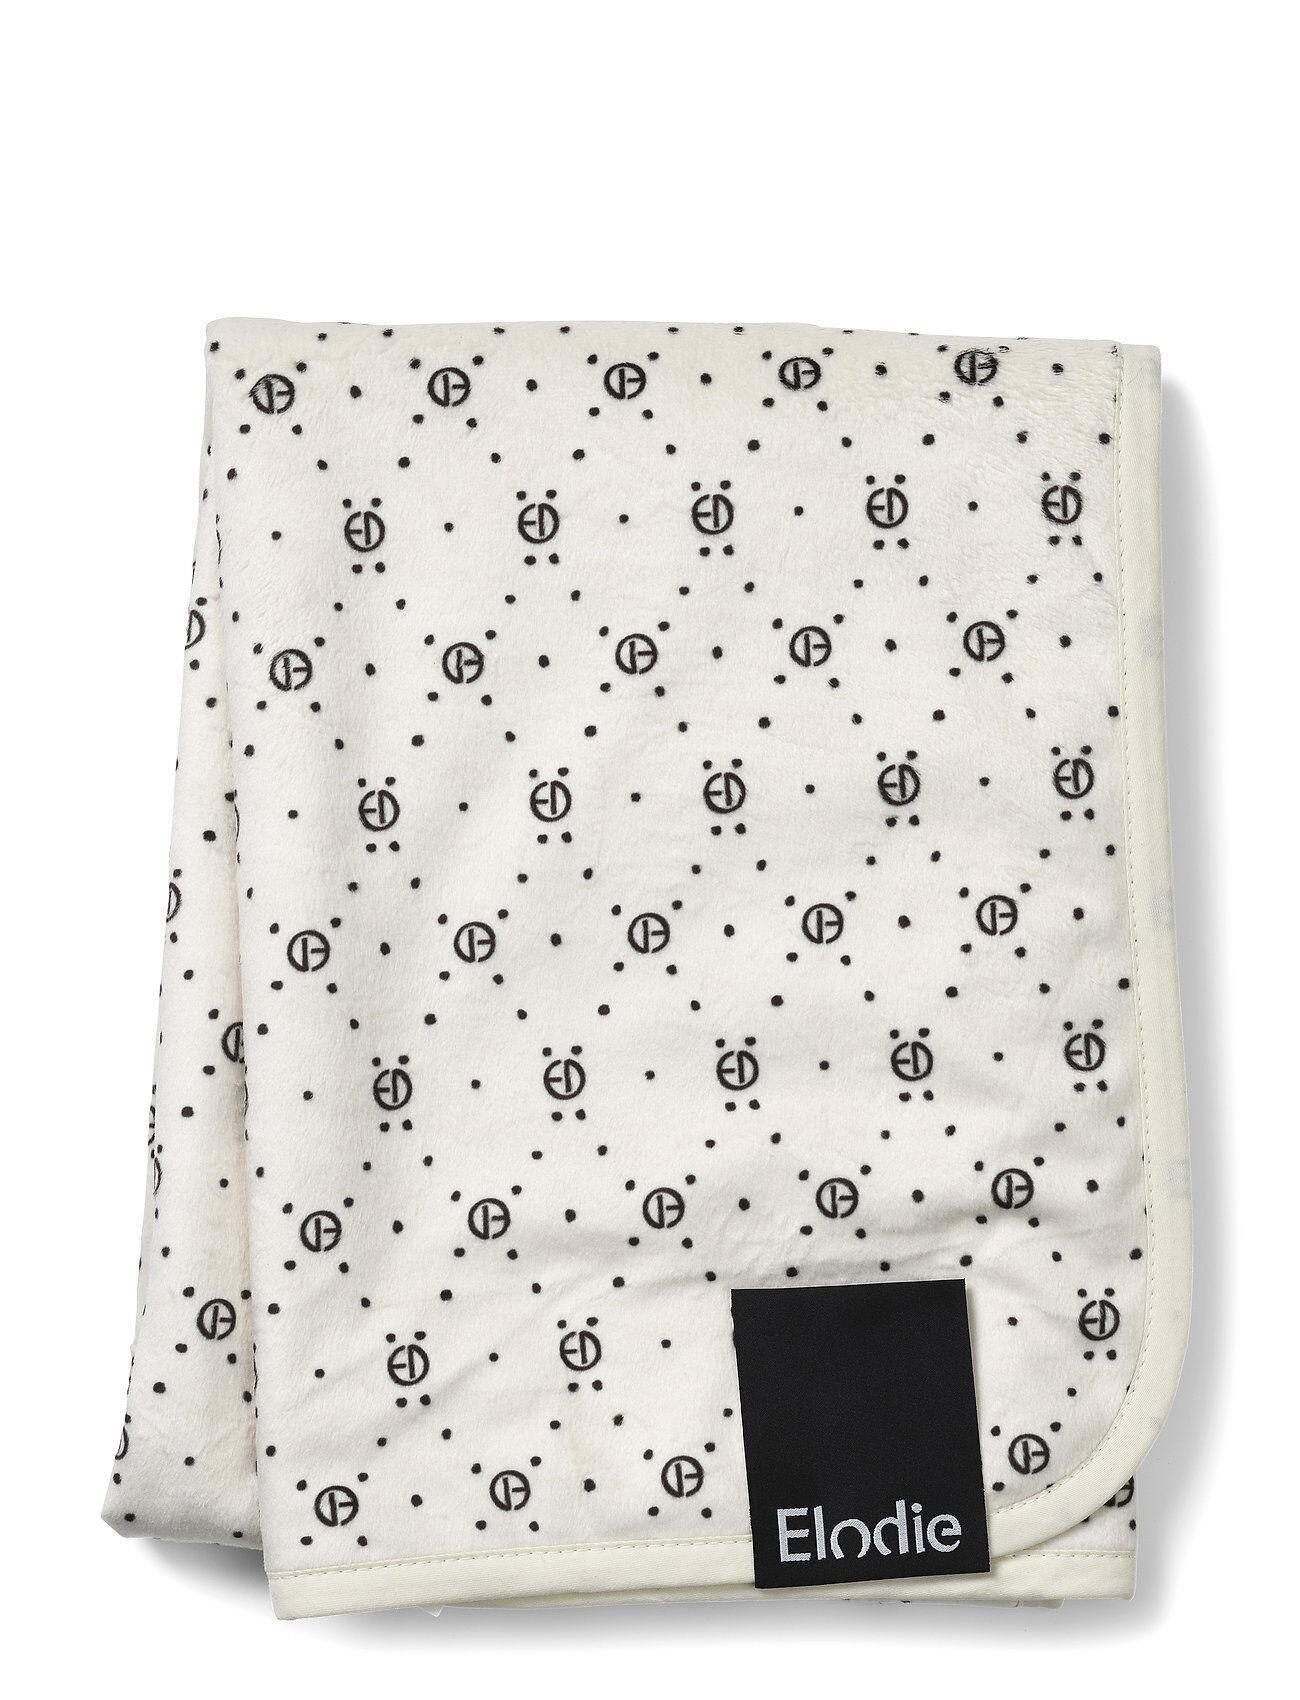 Elodie Details Pearl Velvet Blanket - Monogram Home Sleep Time Blankets & Quilts Valkoinen Elodie Details